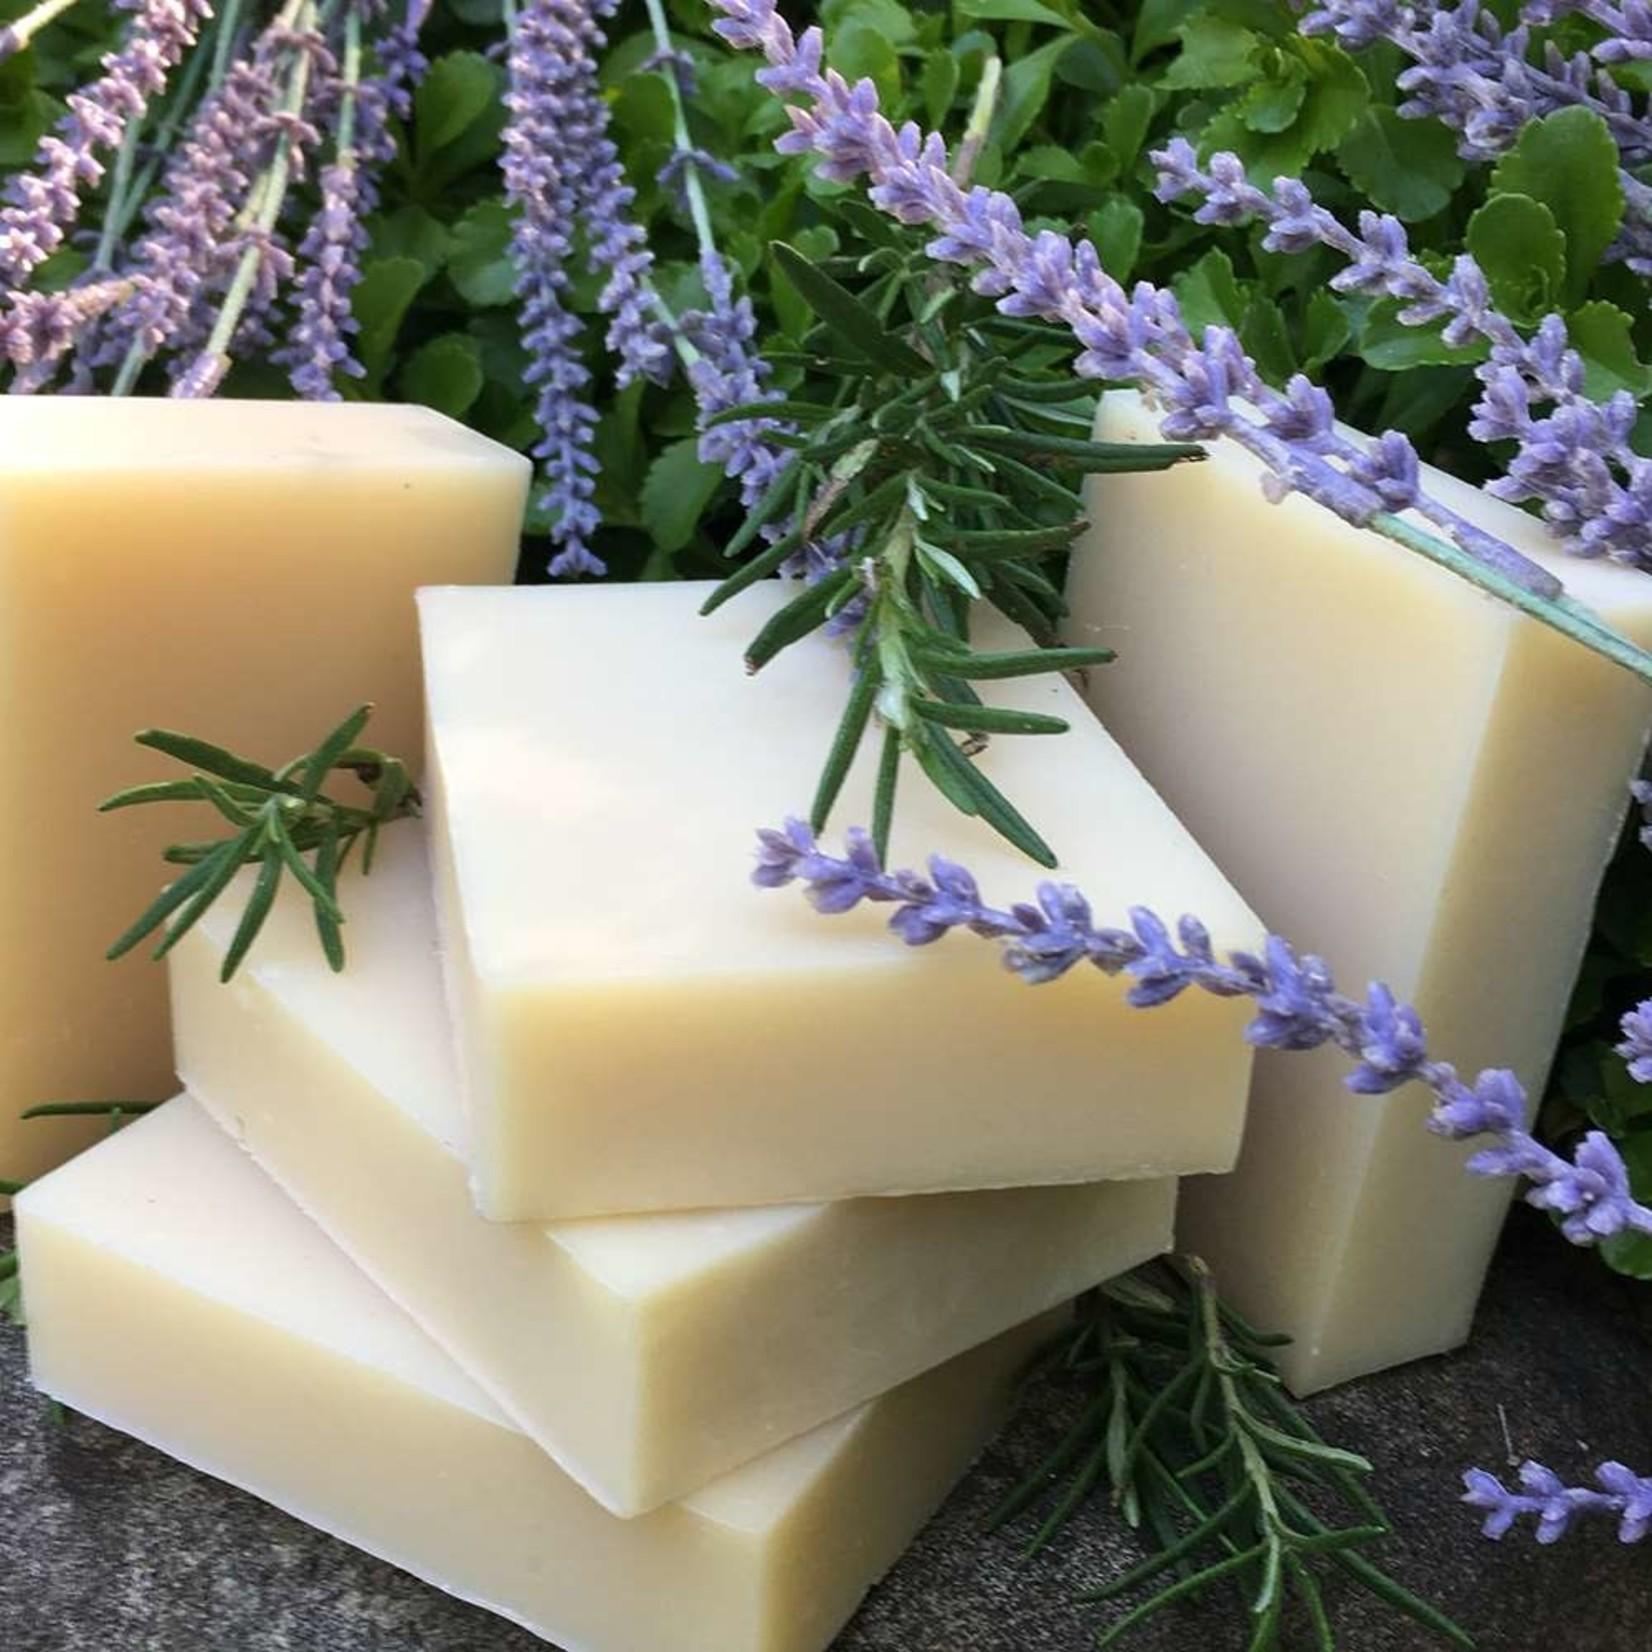 Chagrin Valley Soap and Salve Rosemary Lavender Shampoo Bar 5.8oz